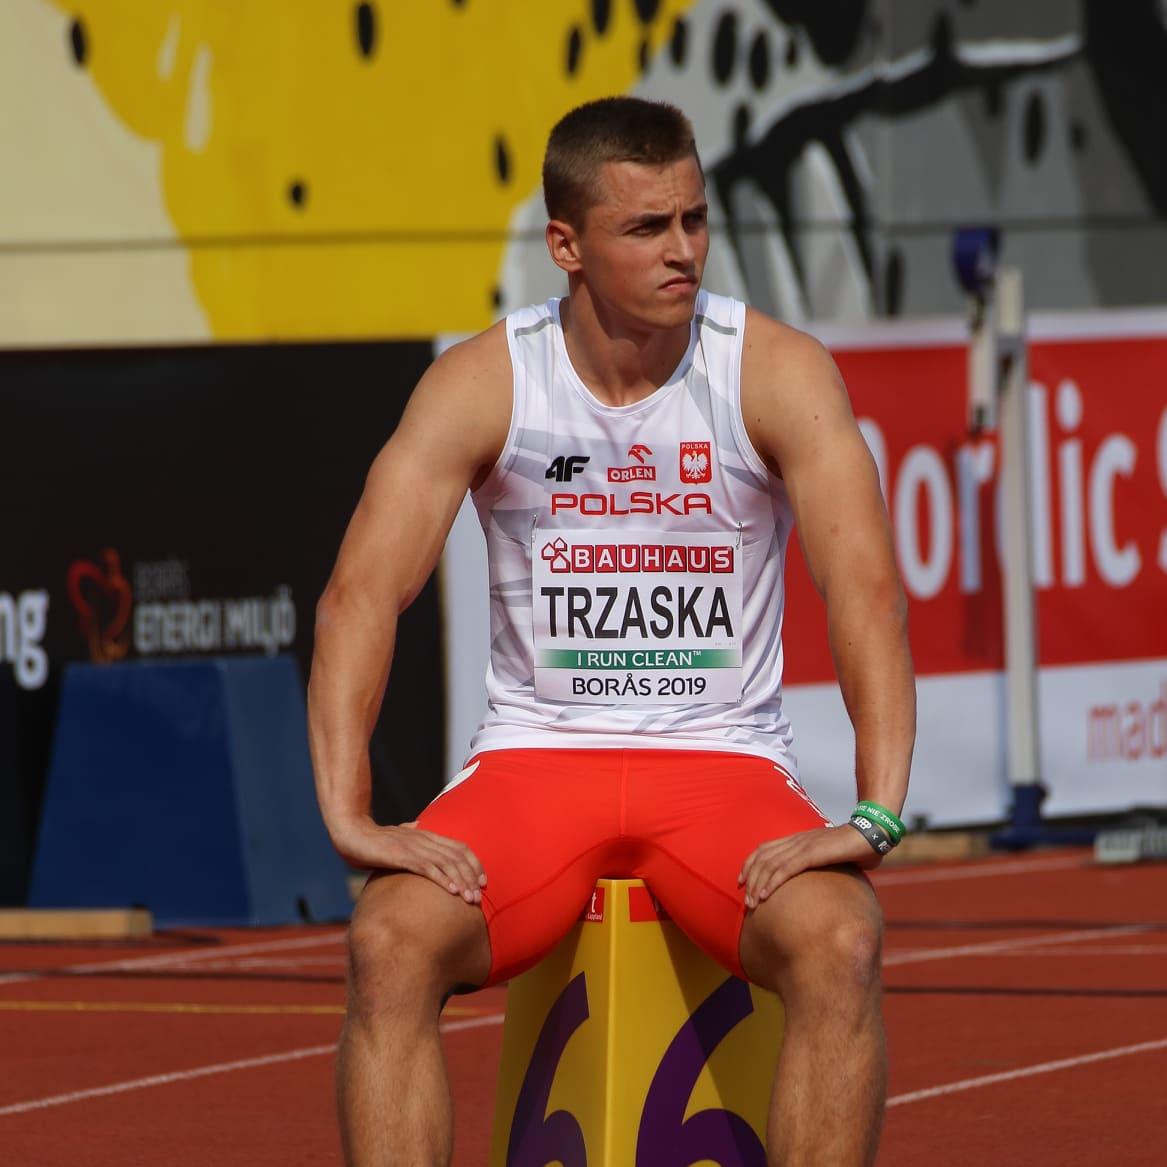 Damian Trzaska